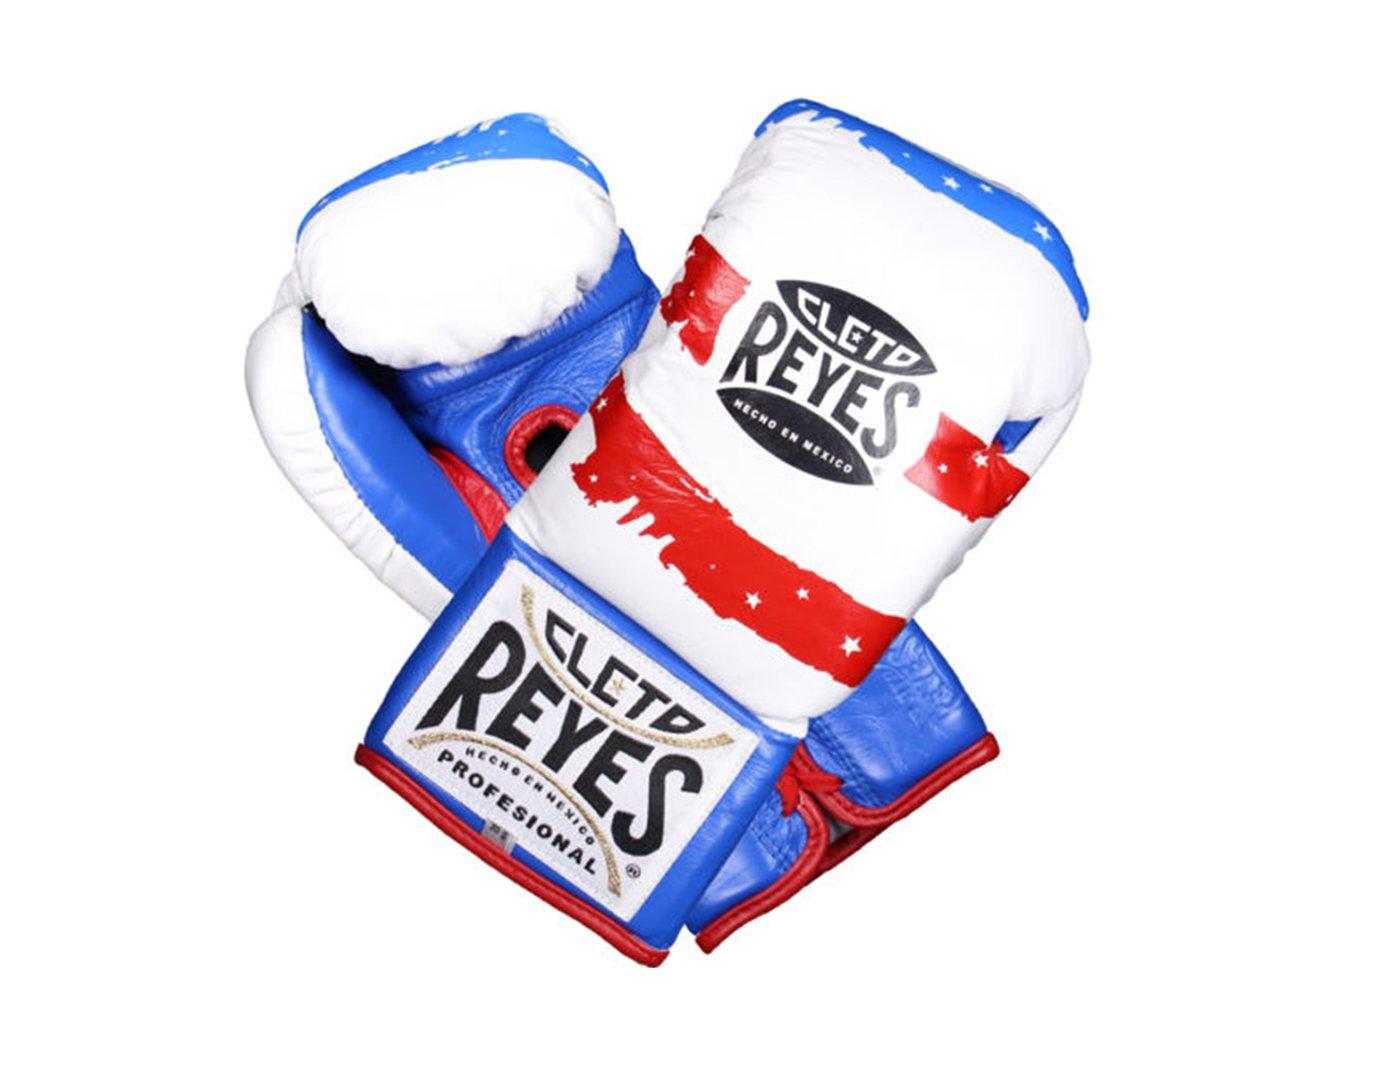 Cleto Reyes Professionalボクシンググローブ USAフラッグ 8oz